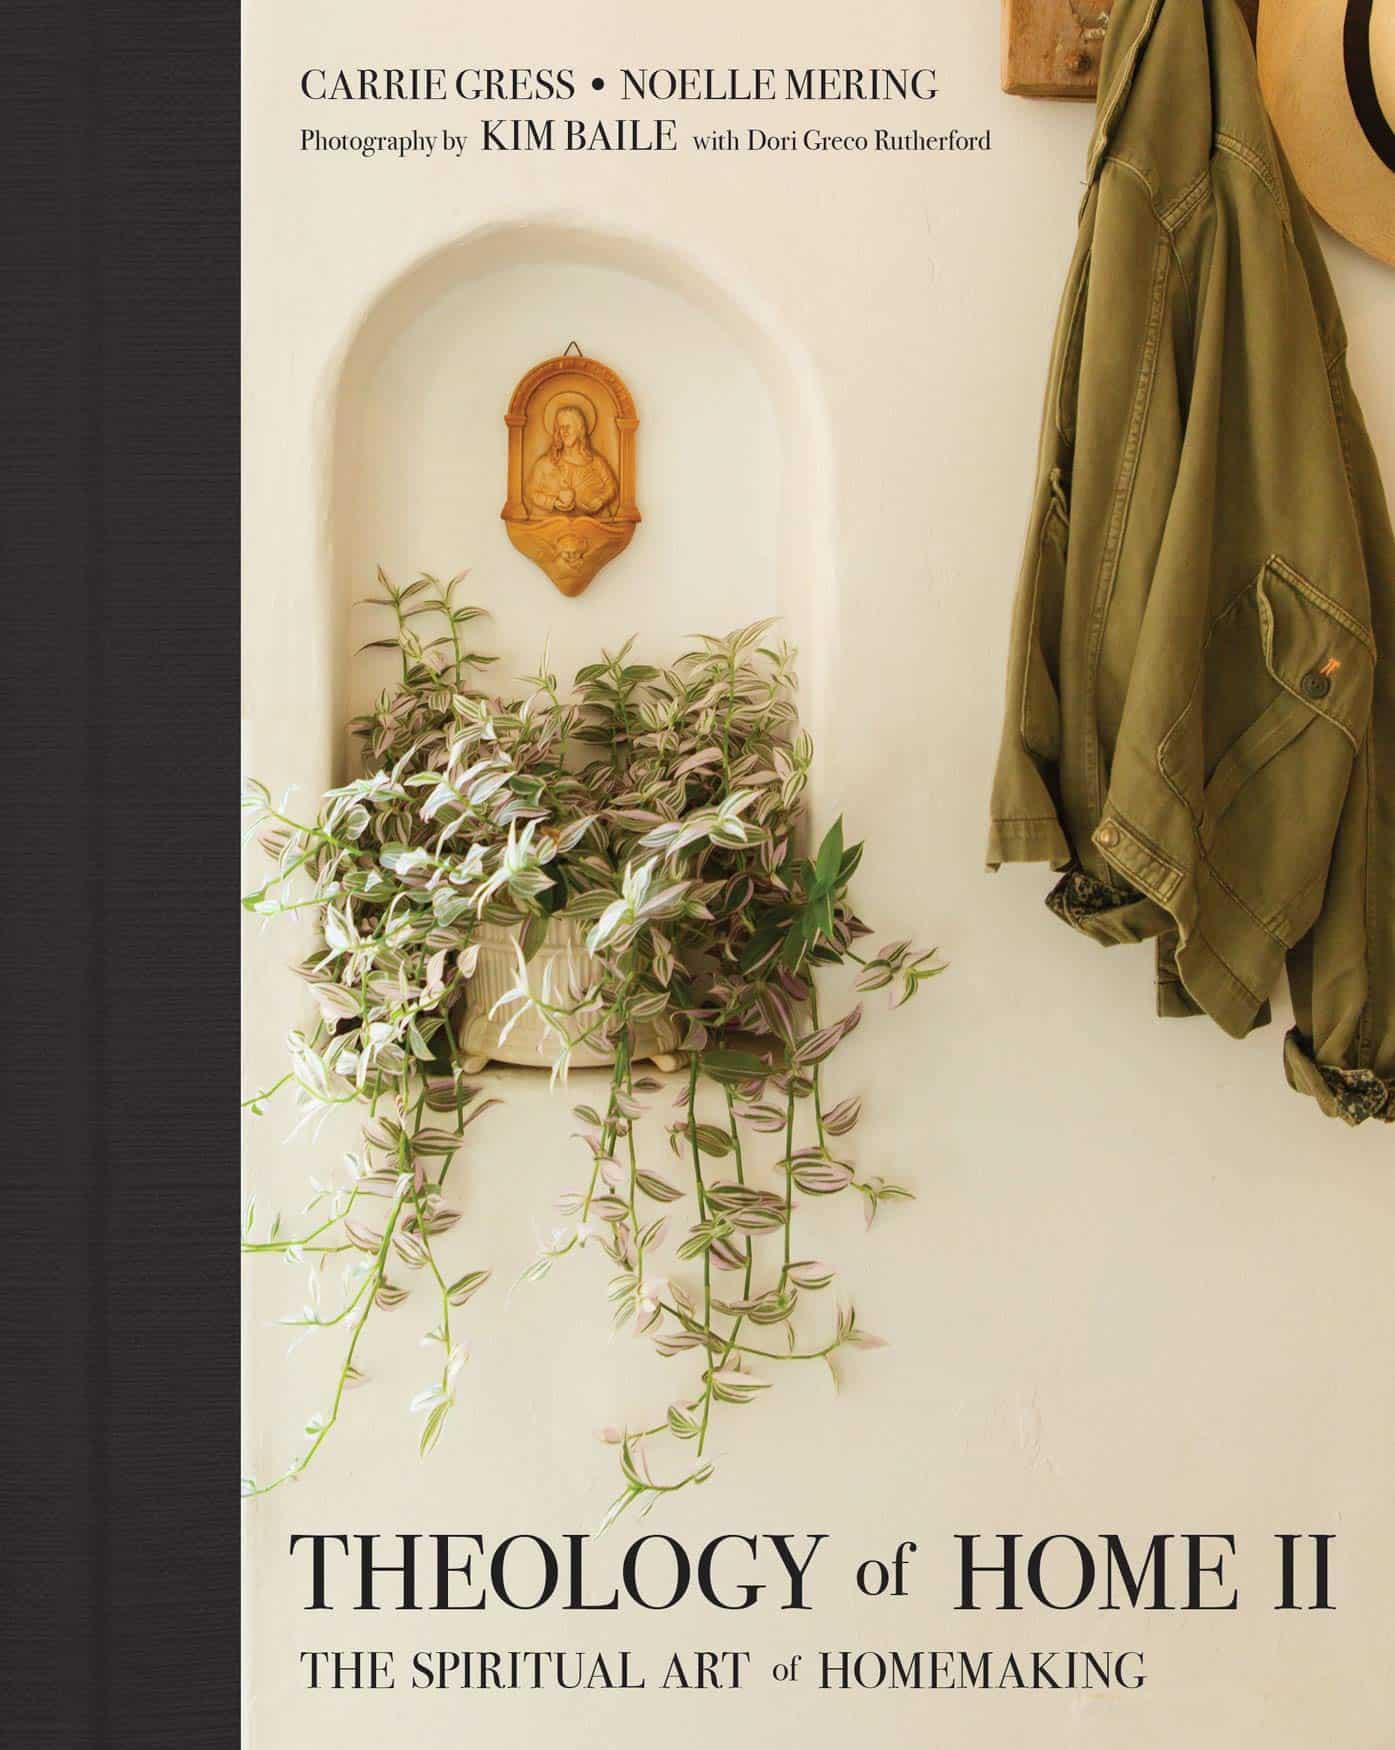 The theology of home, un libro de espiritualidad de lo cotidiano en casa